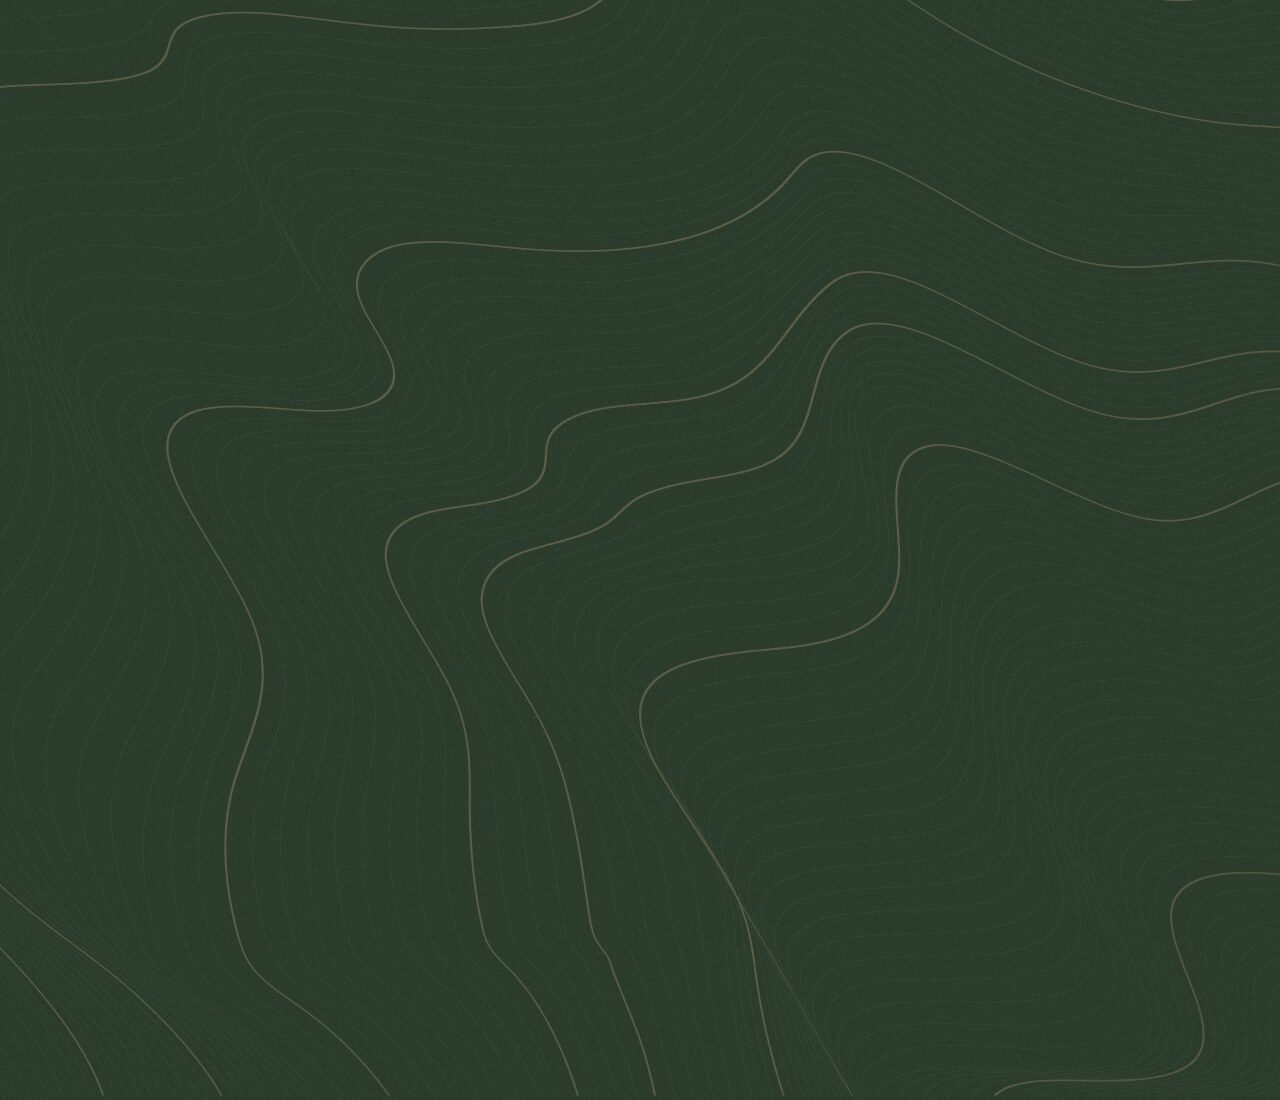 https://nestin.bold-themes.com/classy/wp-content/uploads/sites/5/2020/02/green-background-1280x1100.jpg